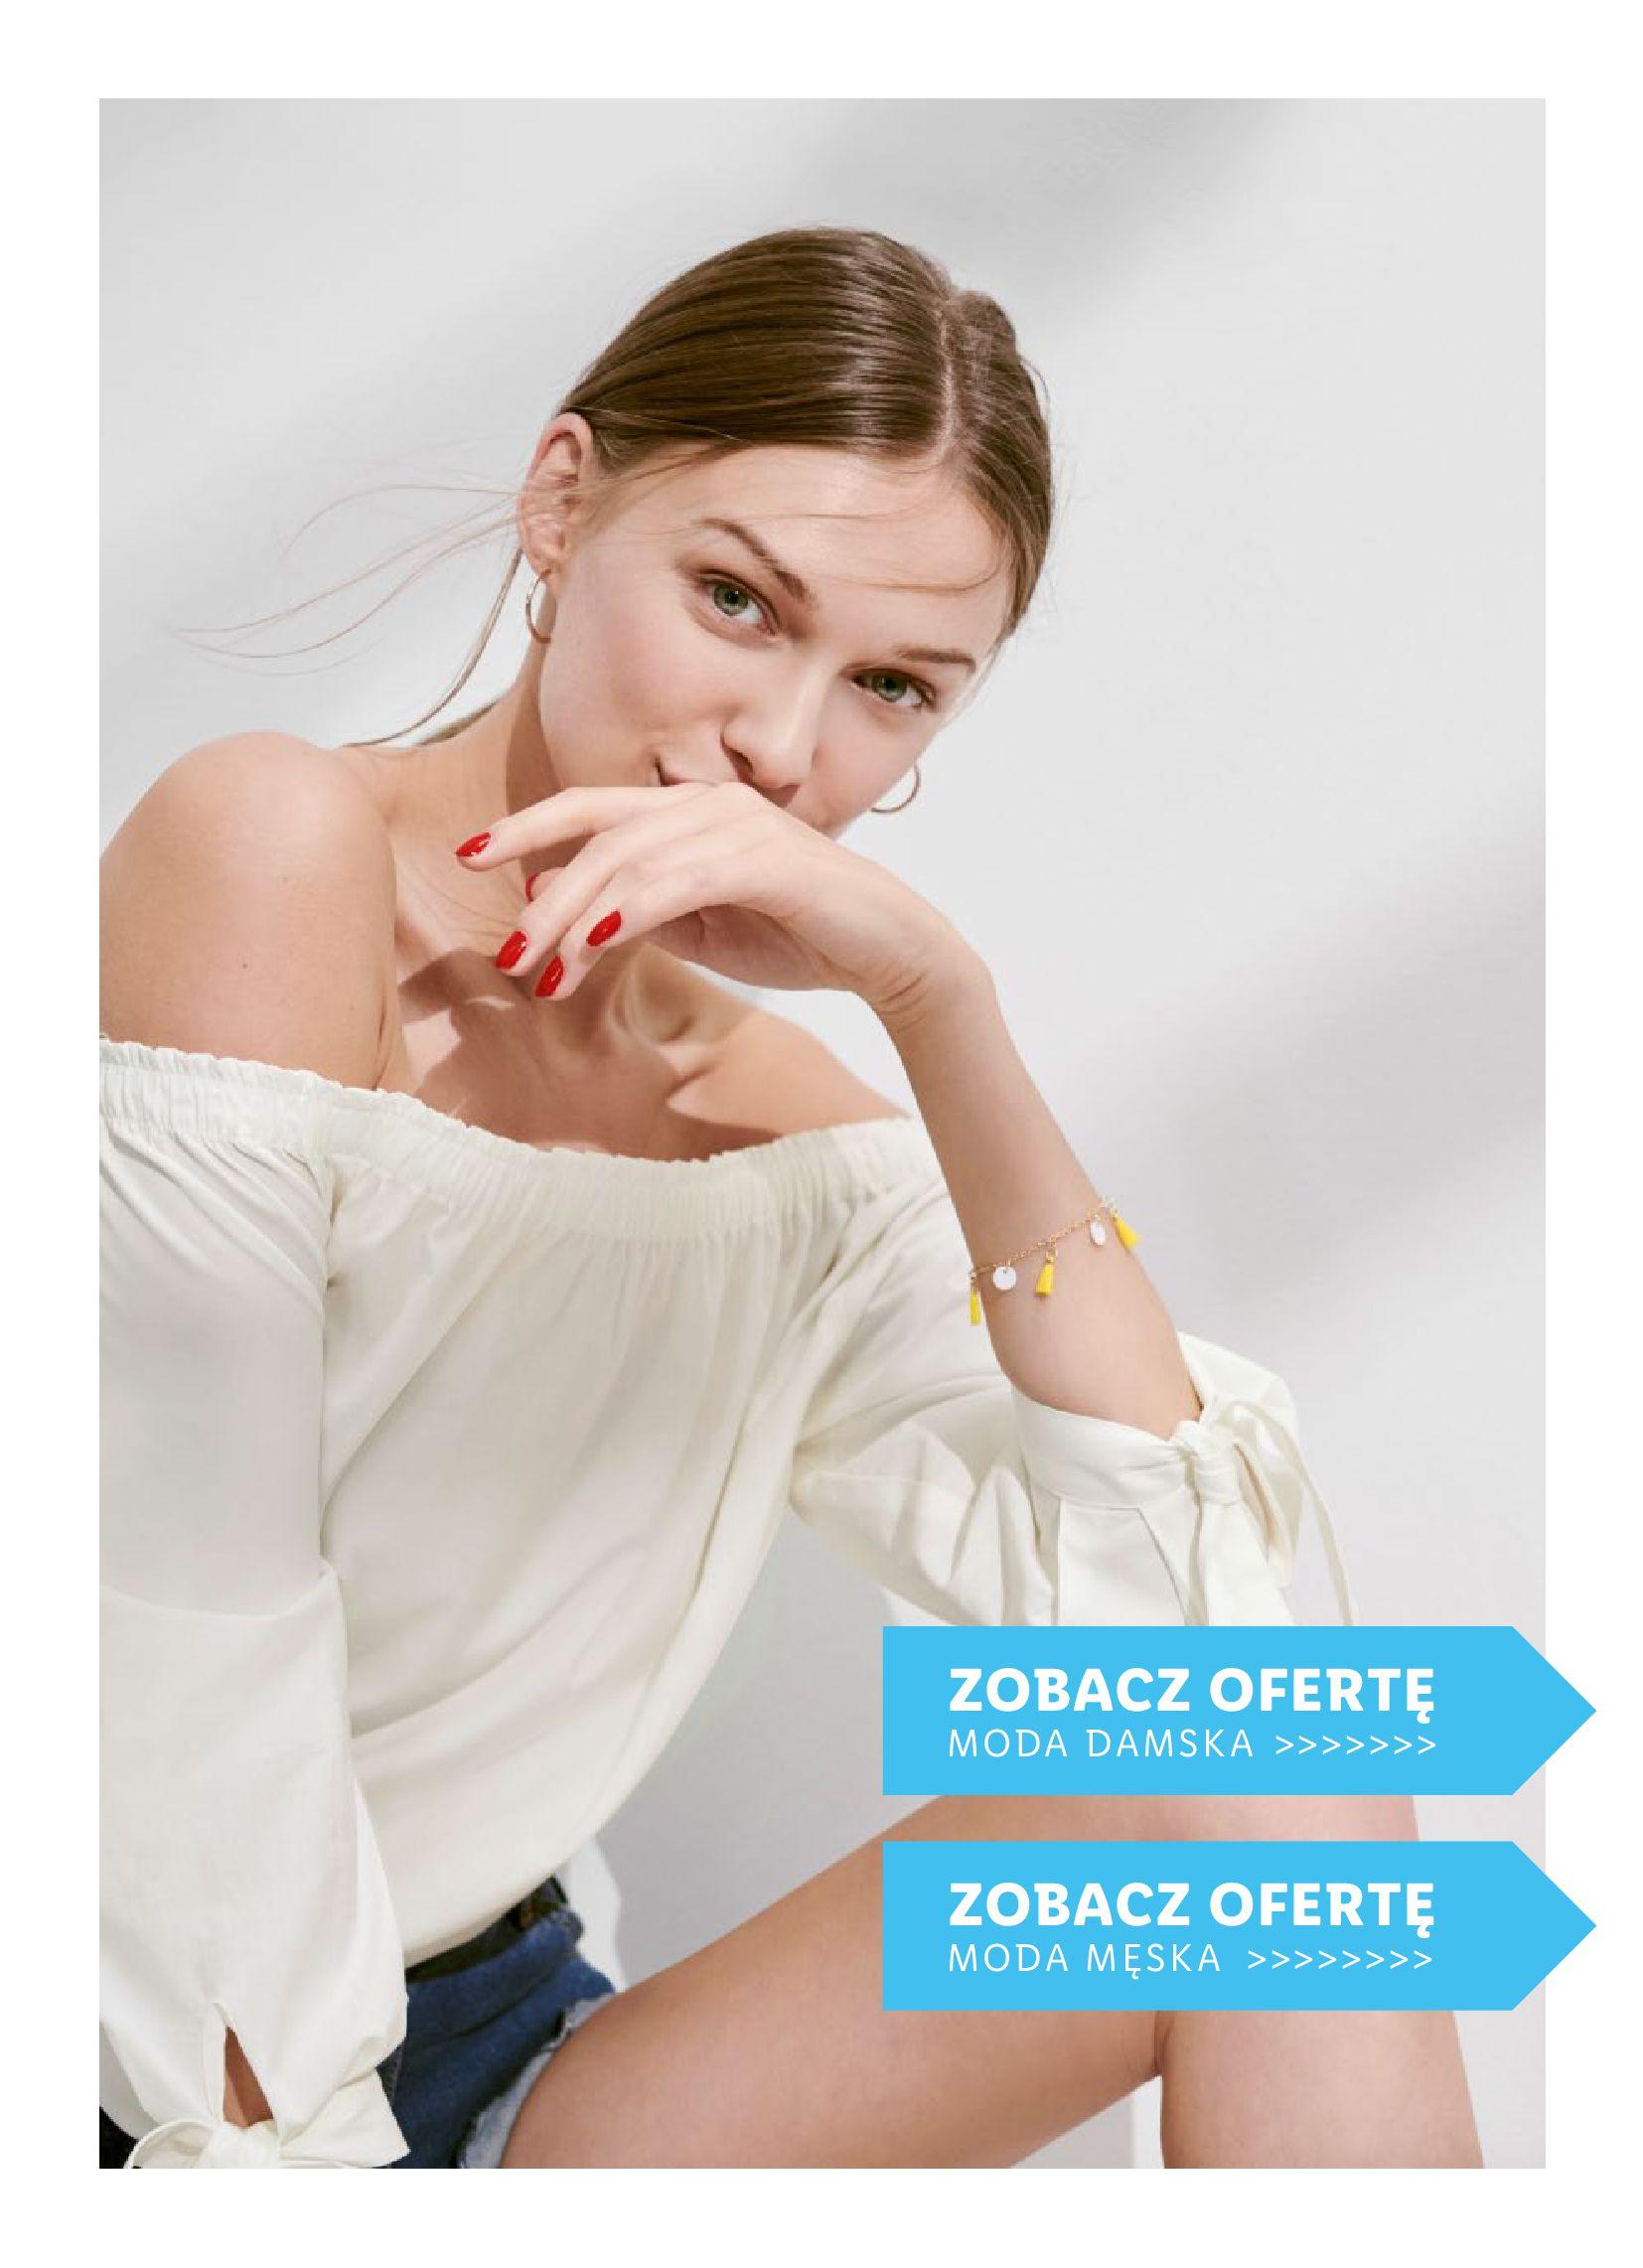 Gazetka Lidl - Lato 2019 Styl Santorini-11.06.2019-12.07.2019-page-